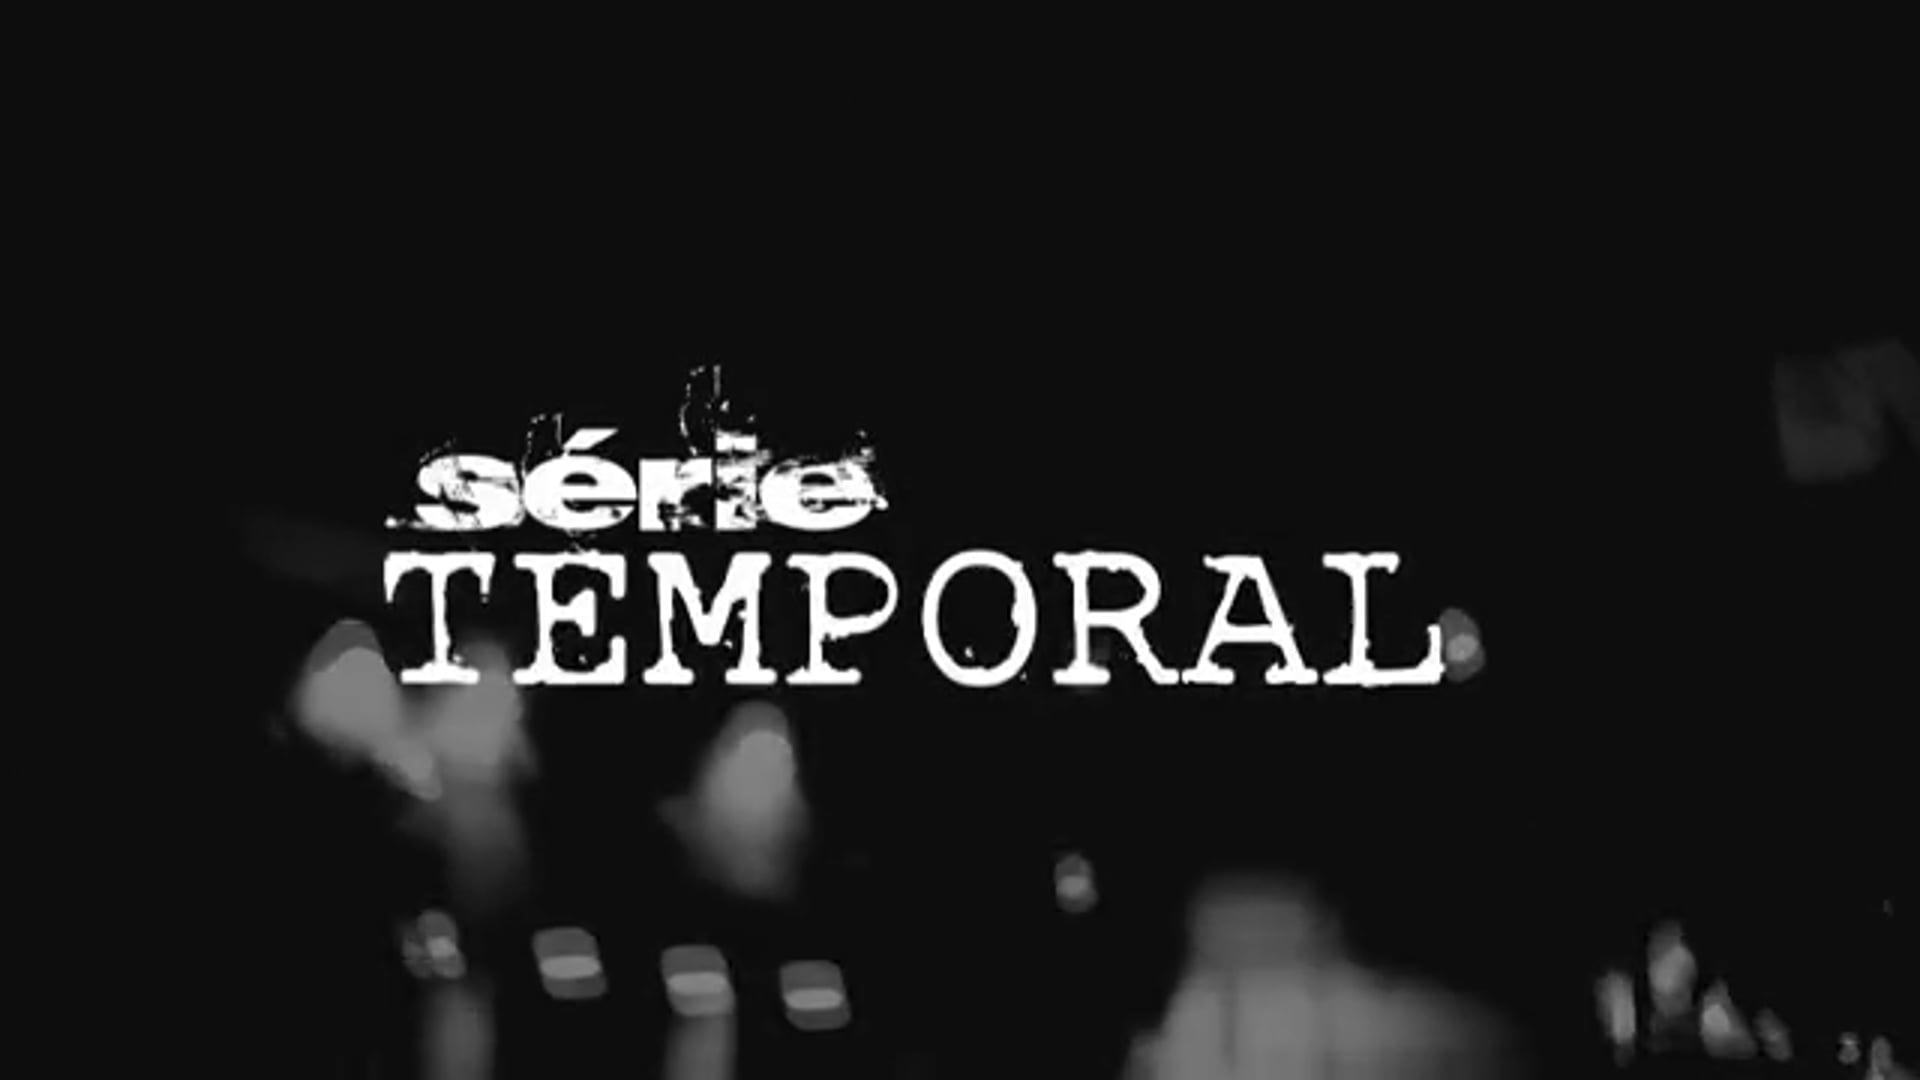 Temporal - Série de TV - SESCTV